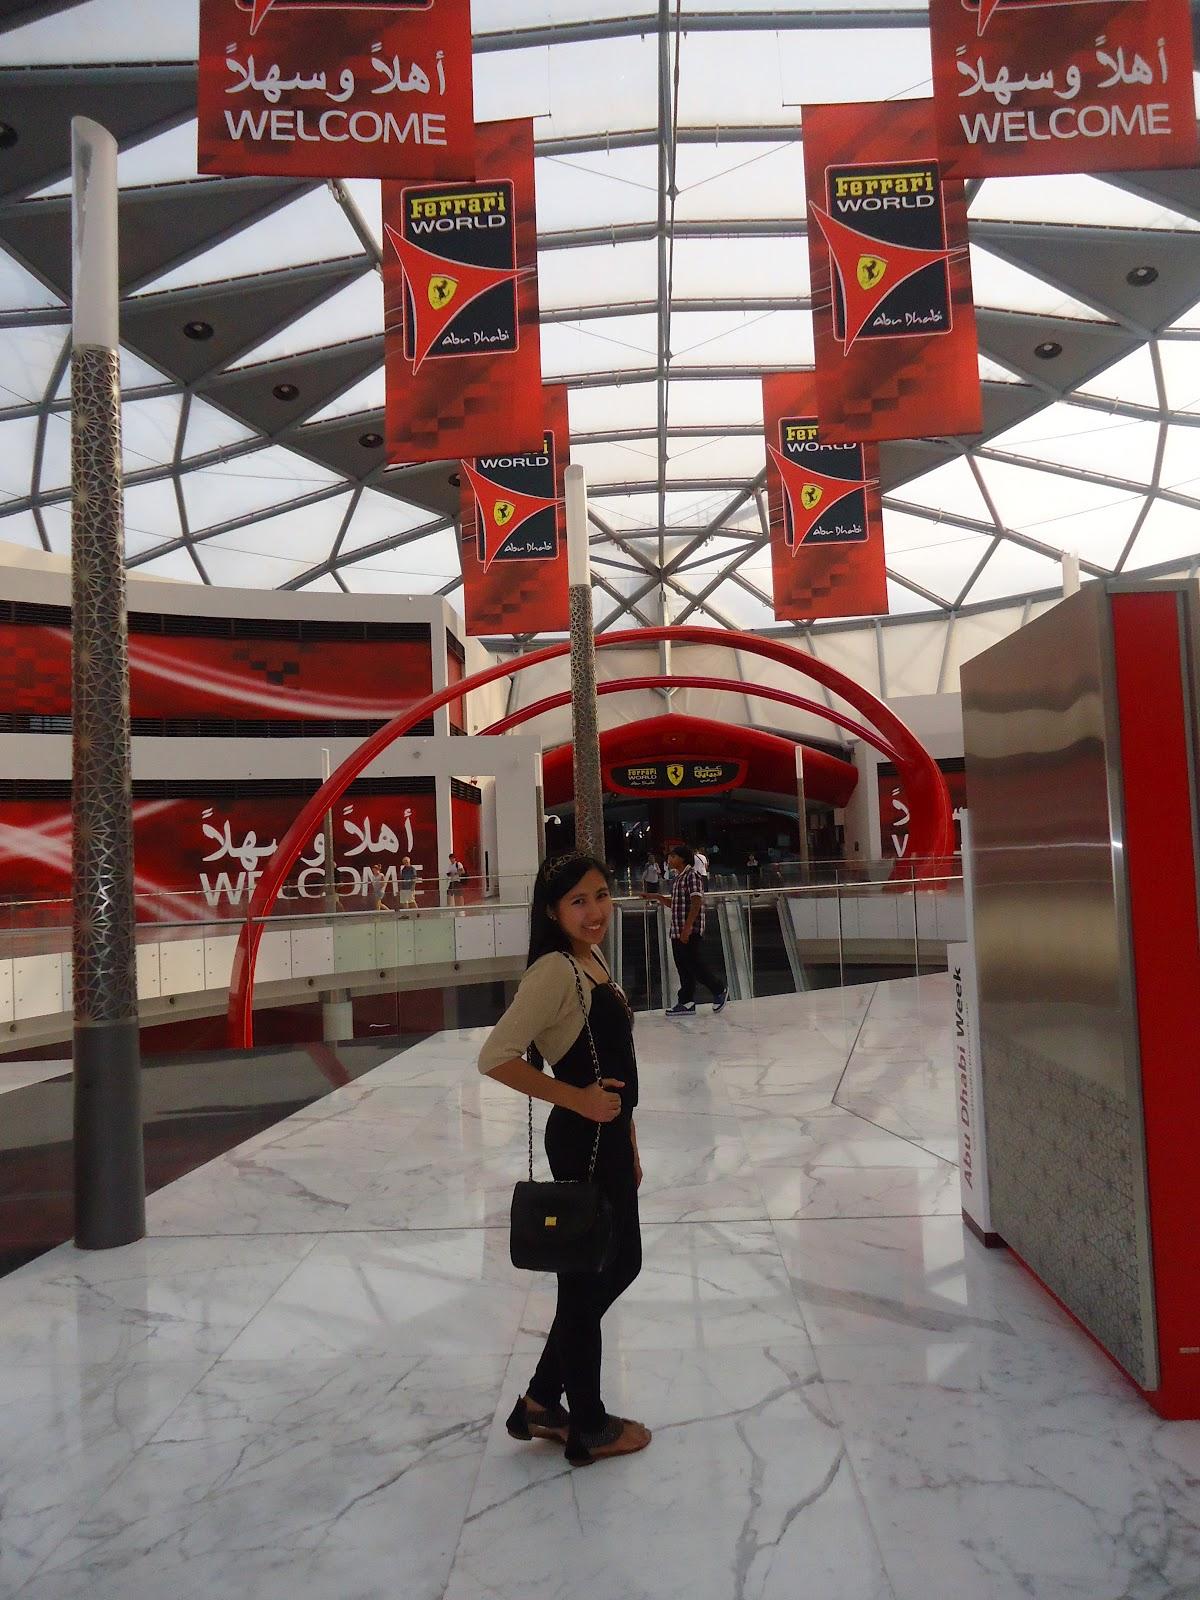 theme park ferrari dubai rules links and world abu dhabi sponsored facilities